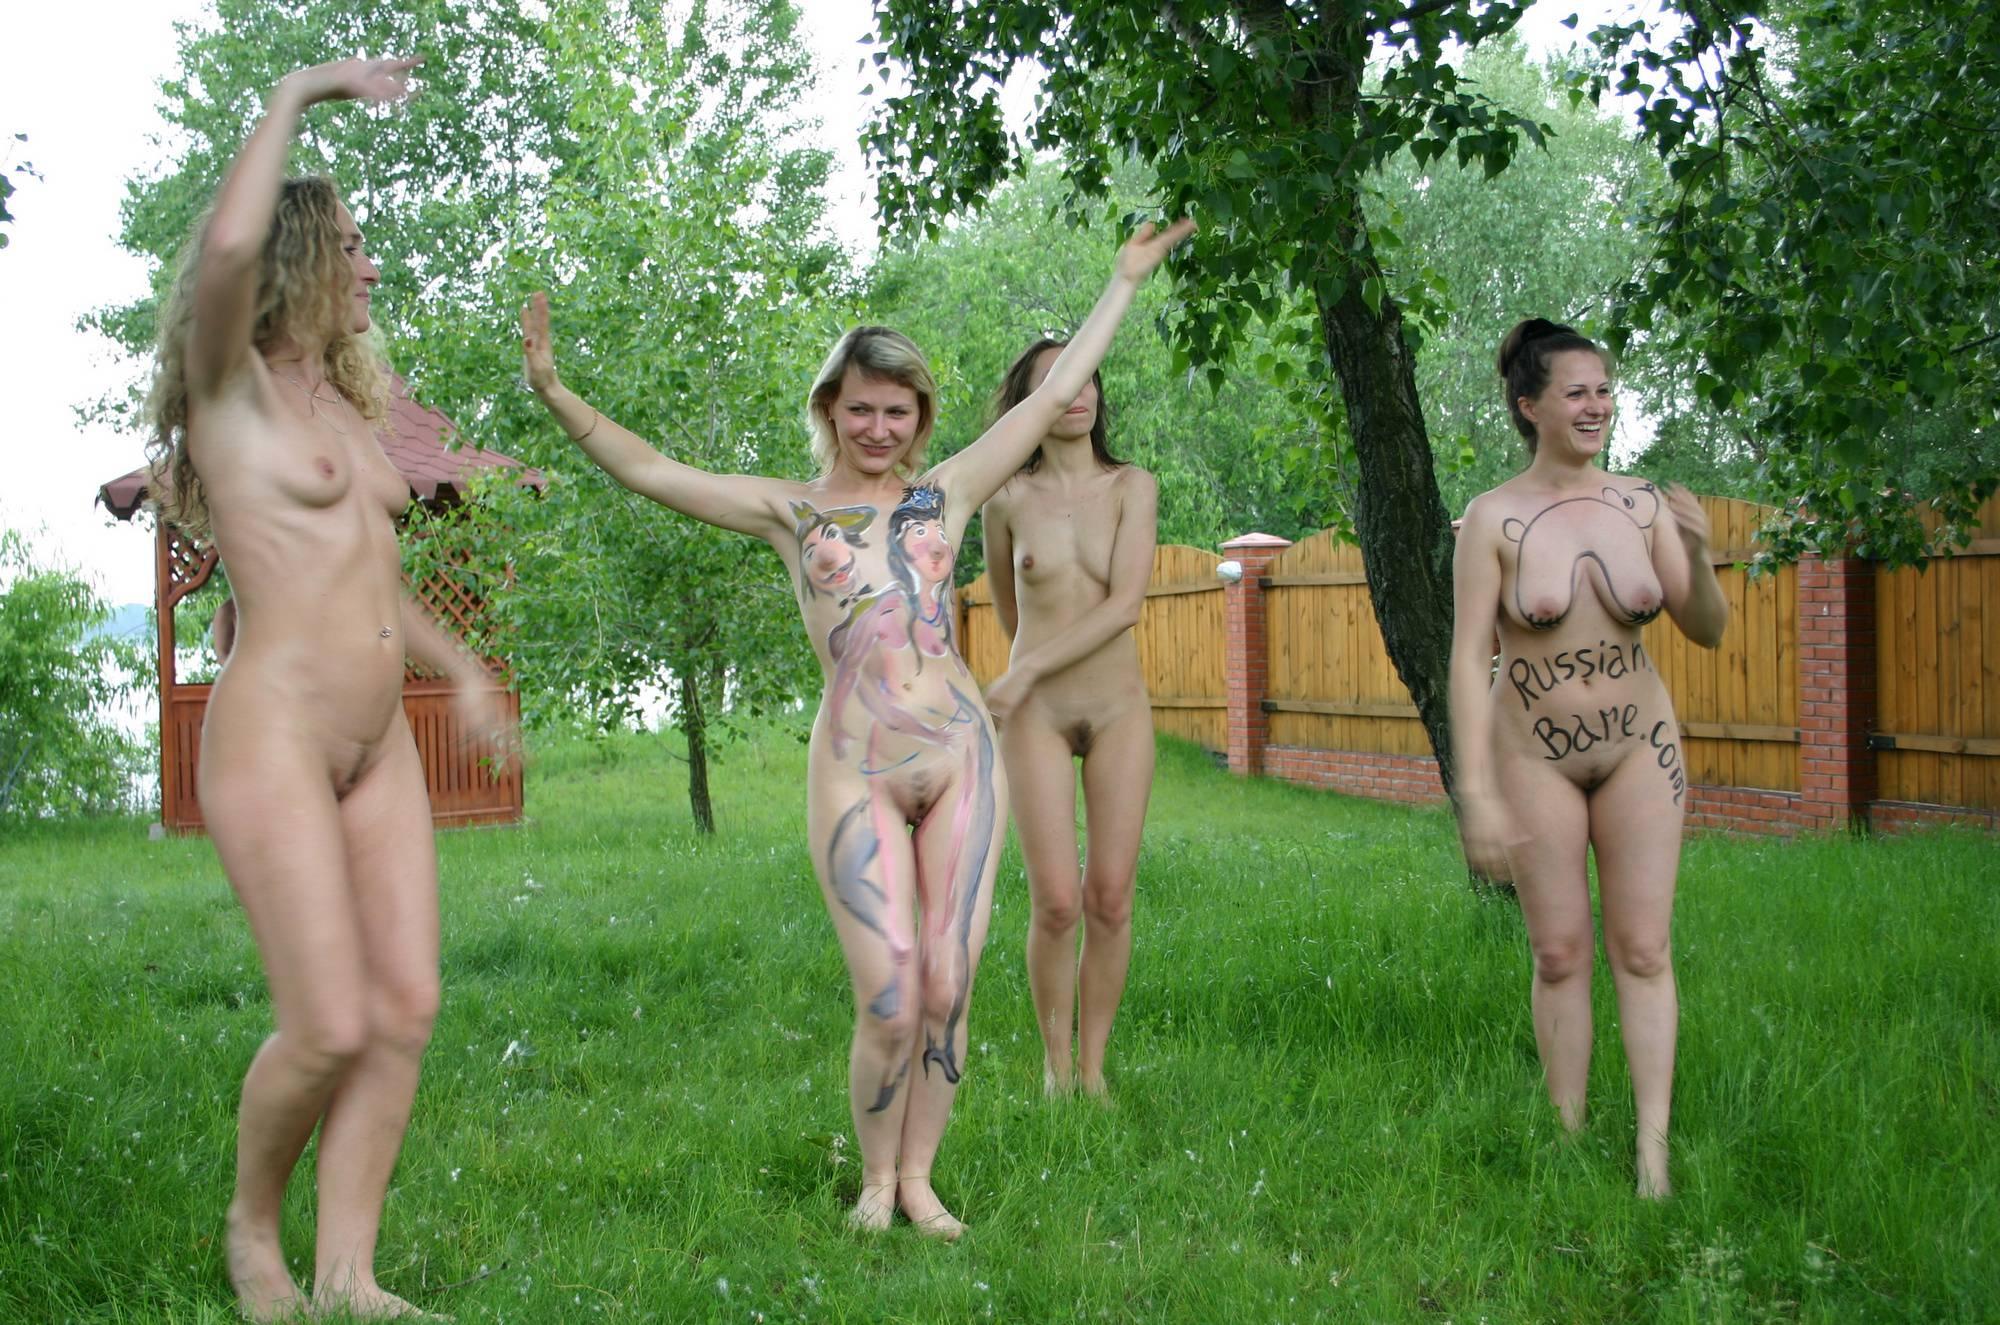 Nudist Gallery Kiev Backyard Greens Play - 1